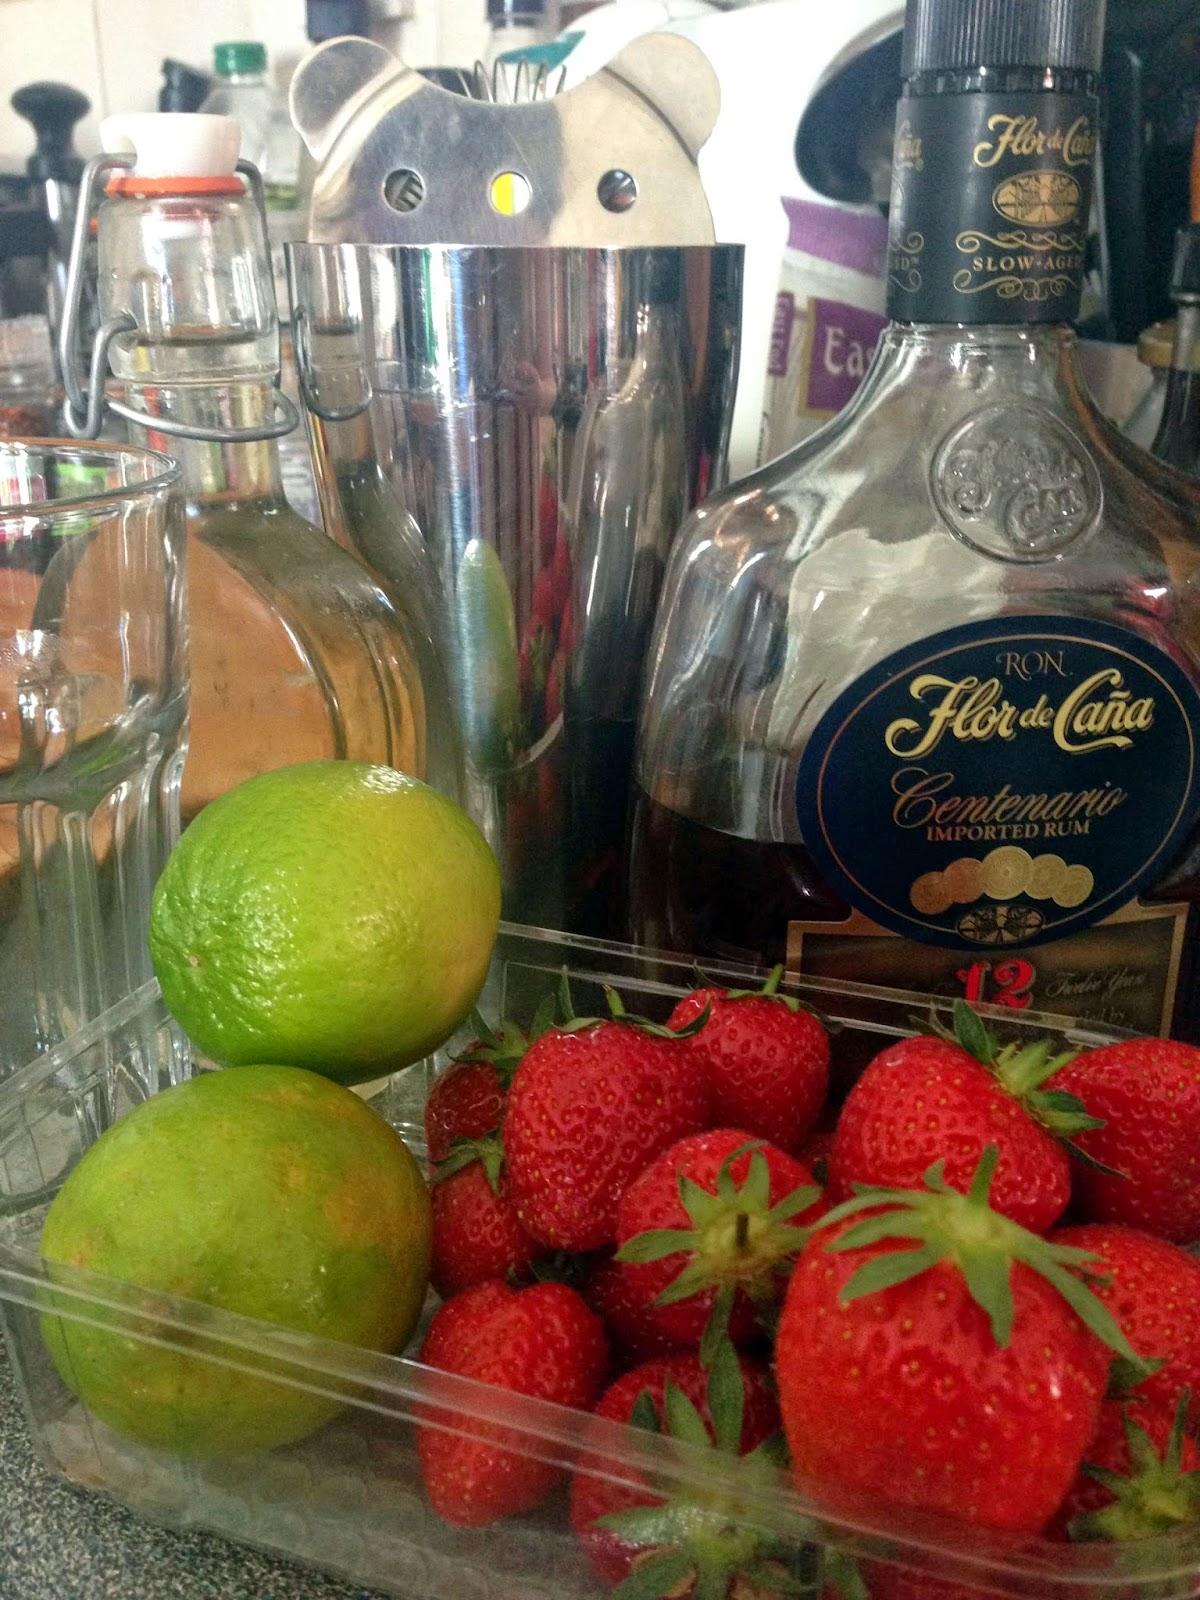 Stitch & Bear - Strawberry daiquiri - ingredients